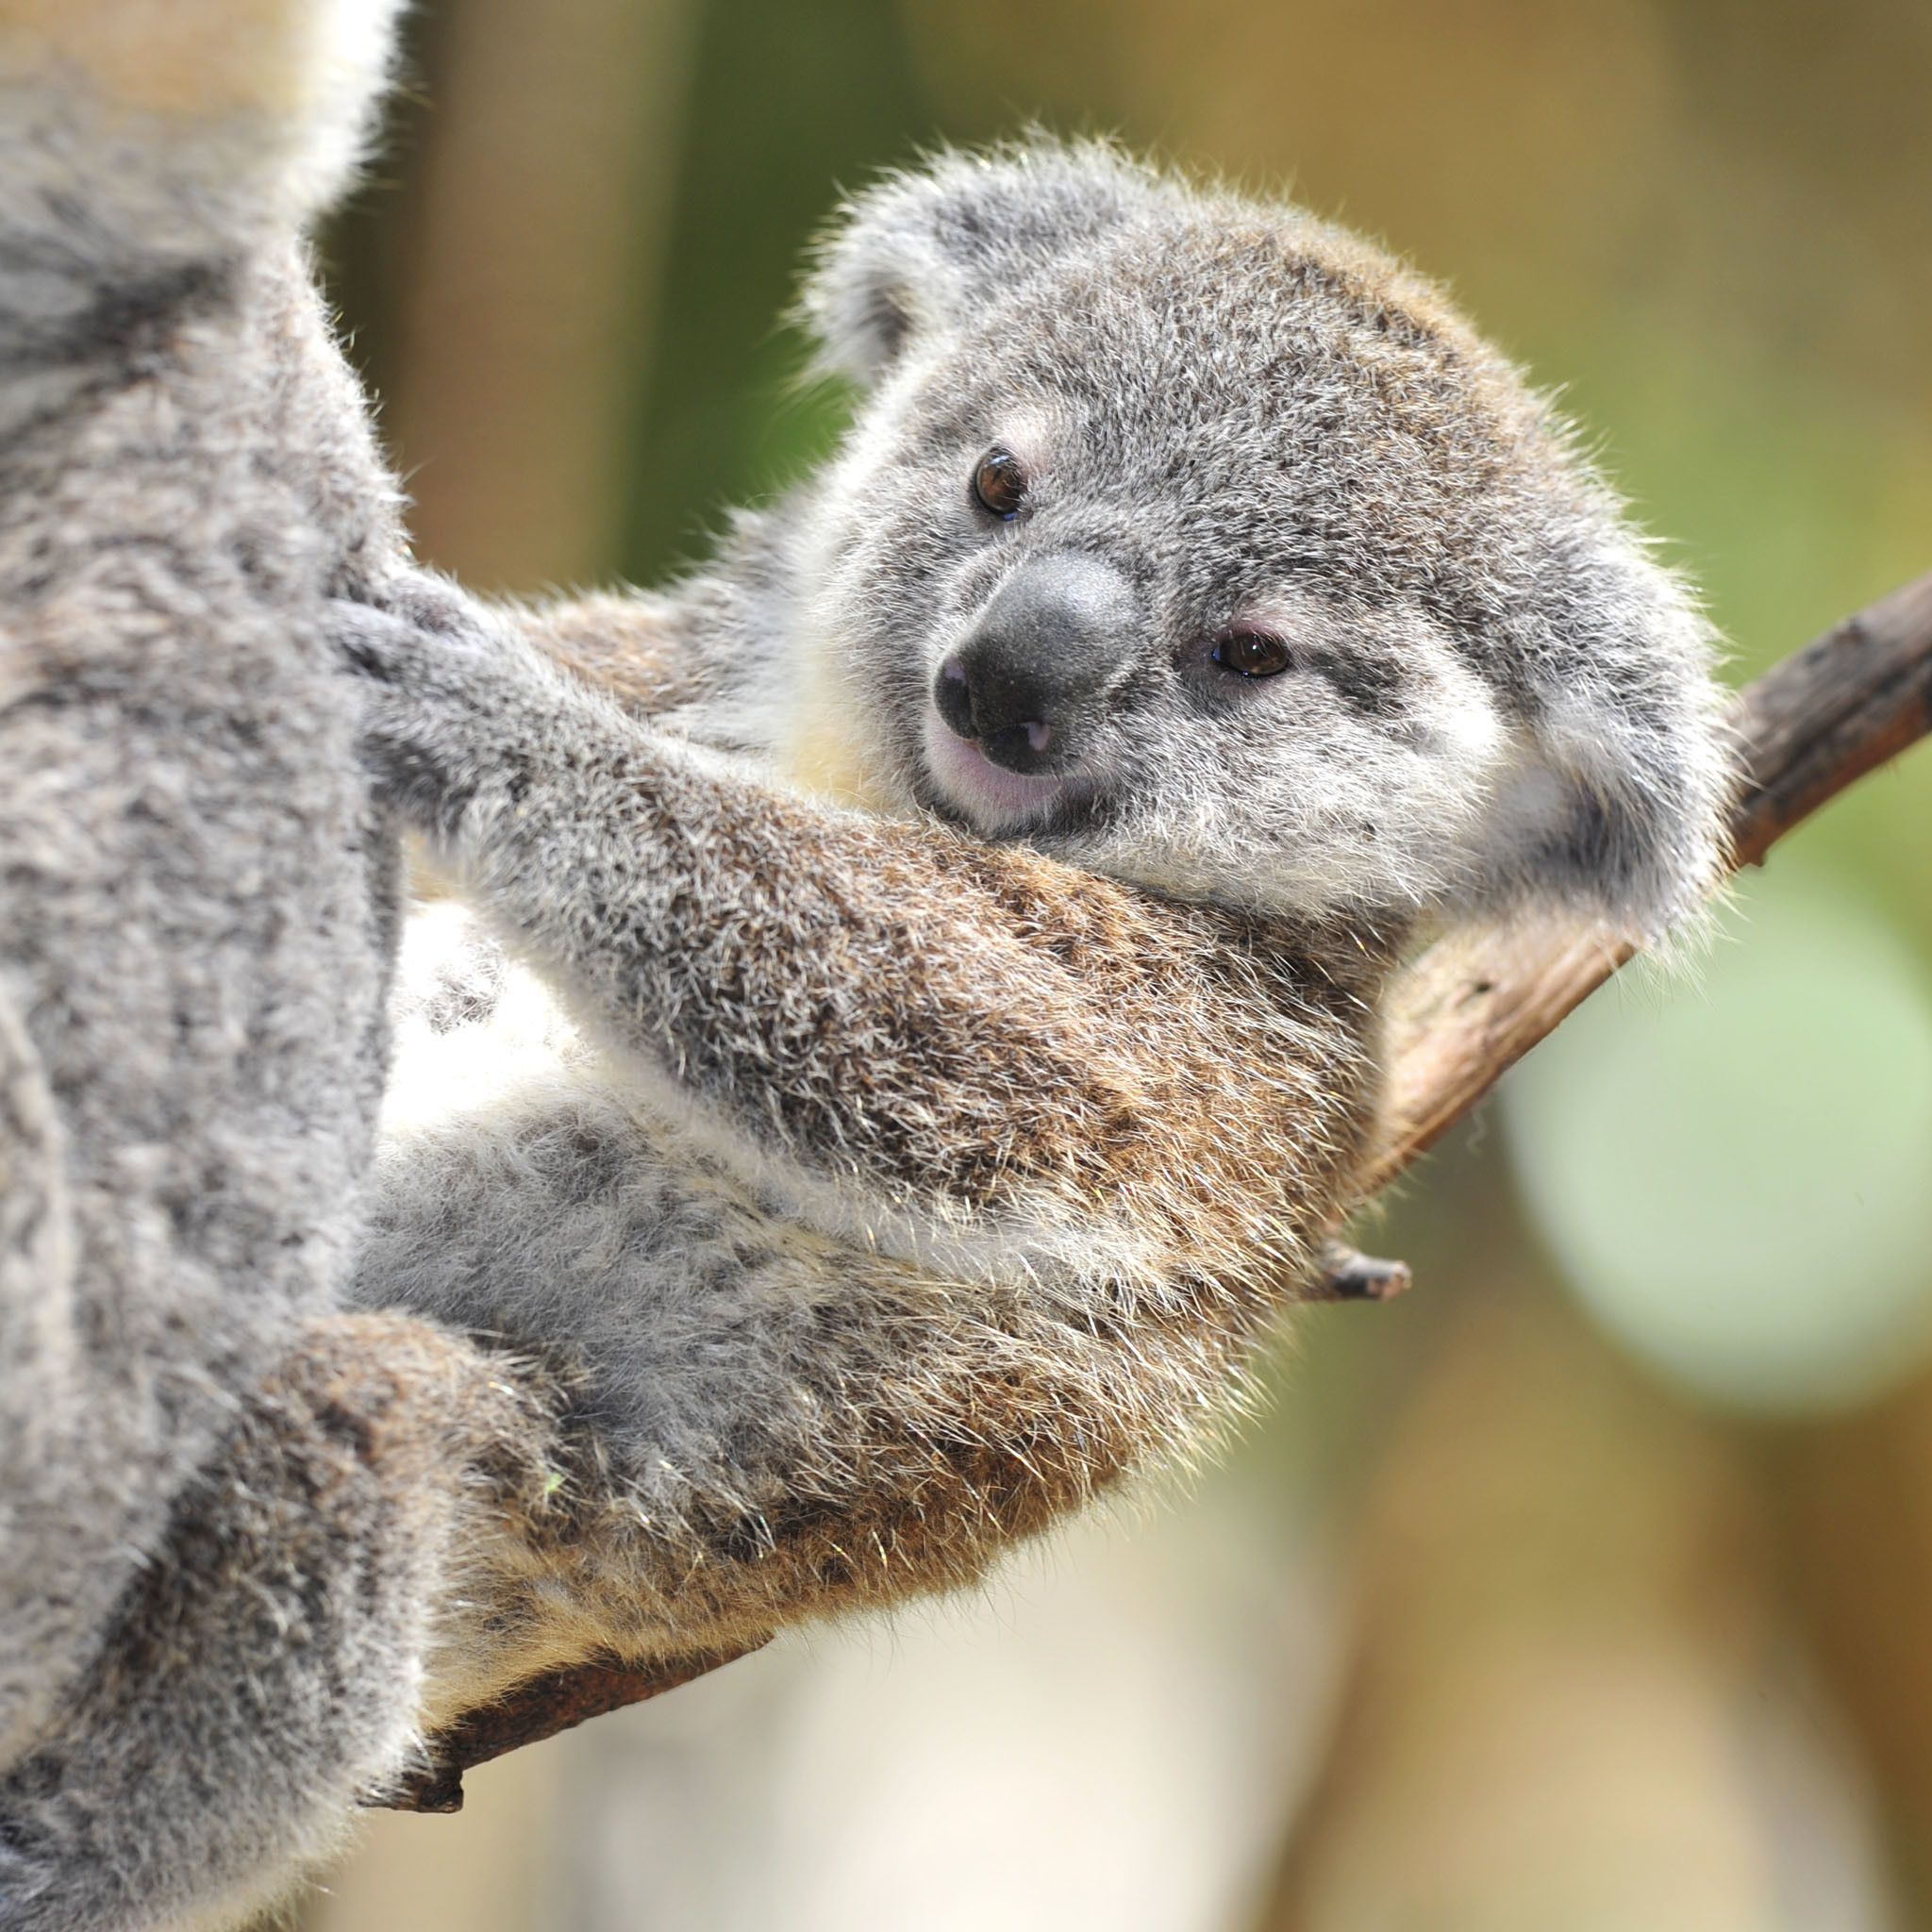 Res 2048x2048 Newborn Baby Koalas Wallpaper Koala Koala Bear Baby Koala